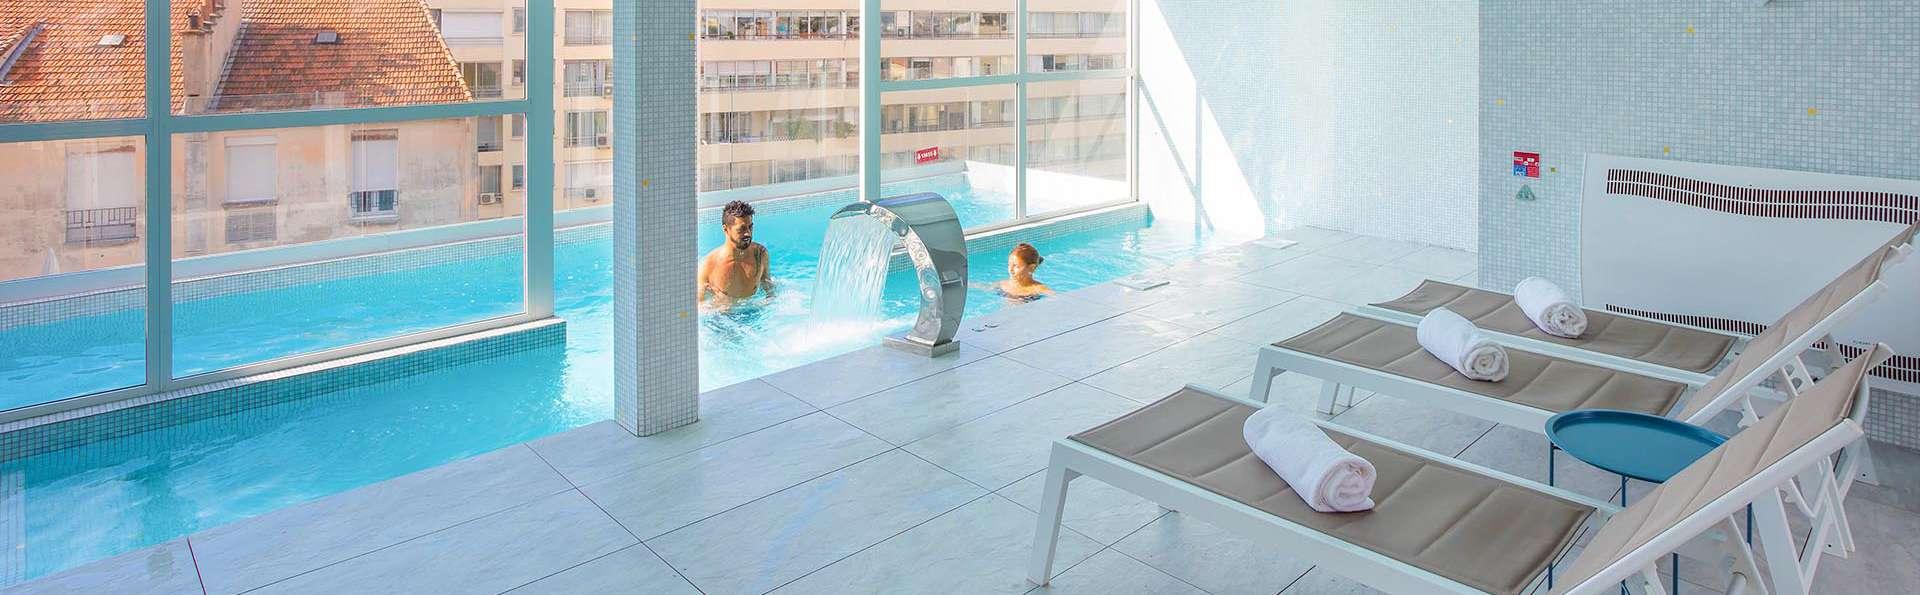 Cristal Hôtel & SPA - EDIT_POOL_03.jpg